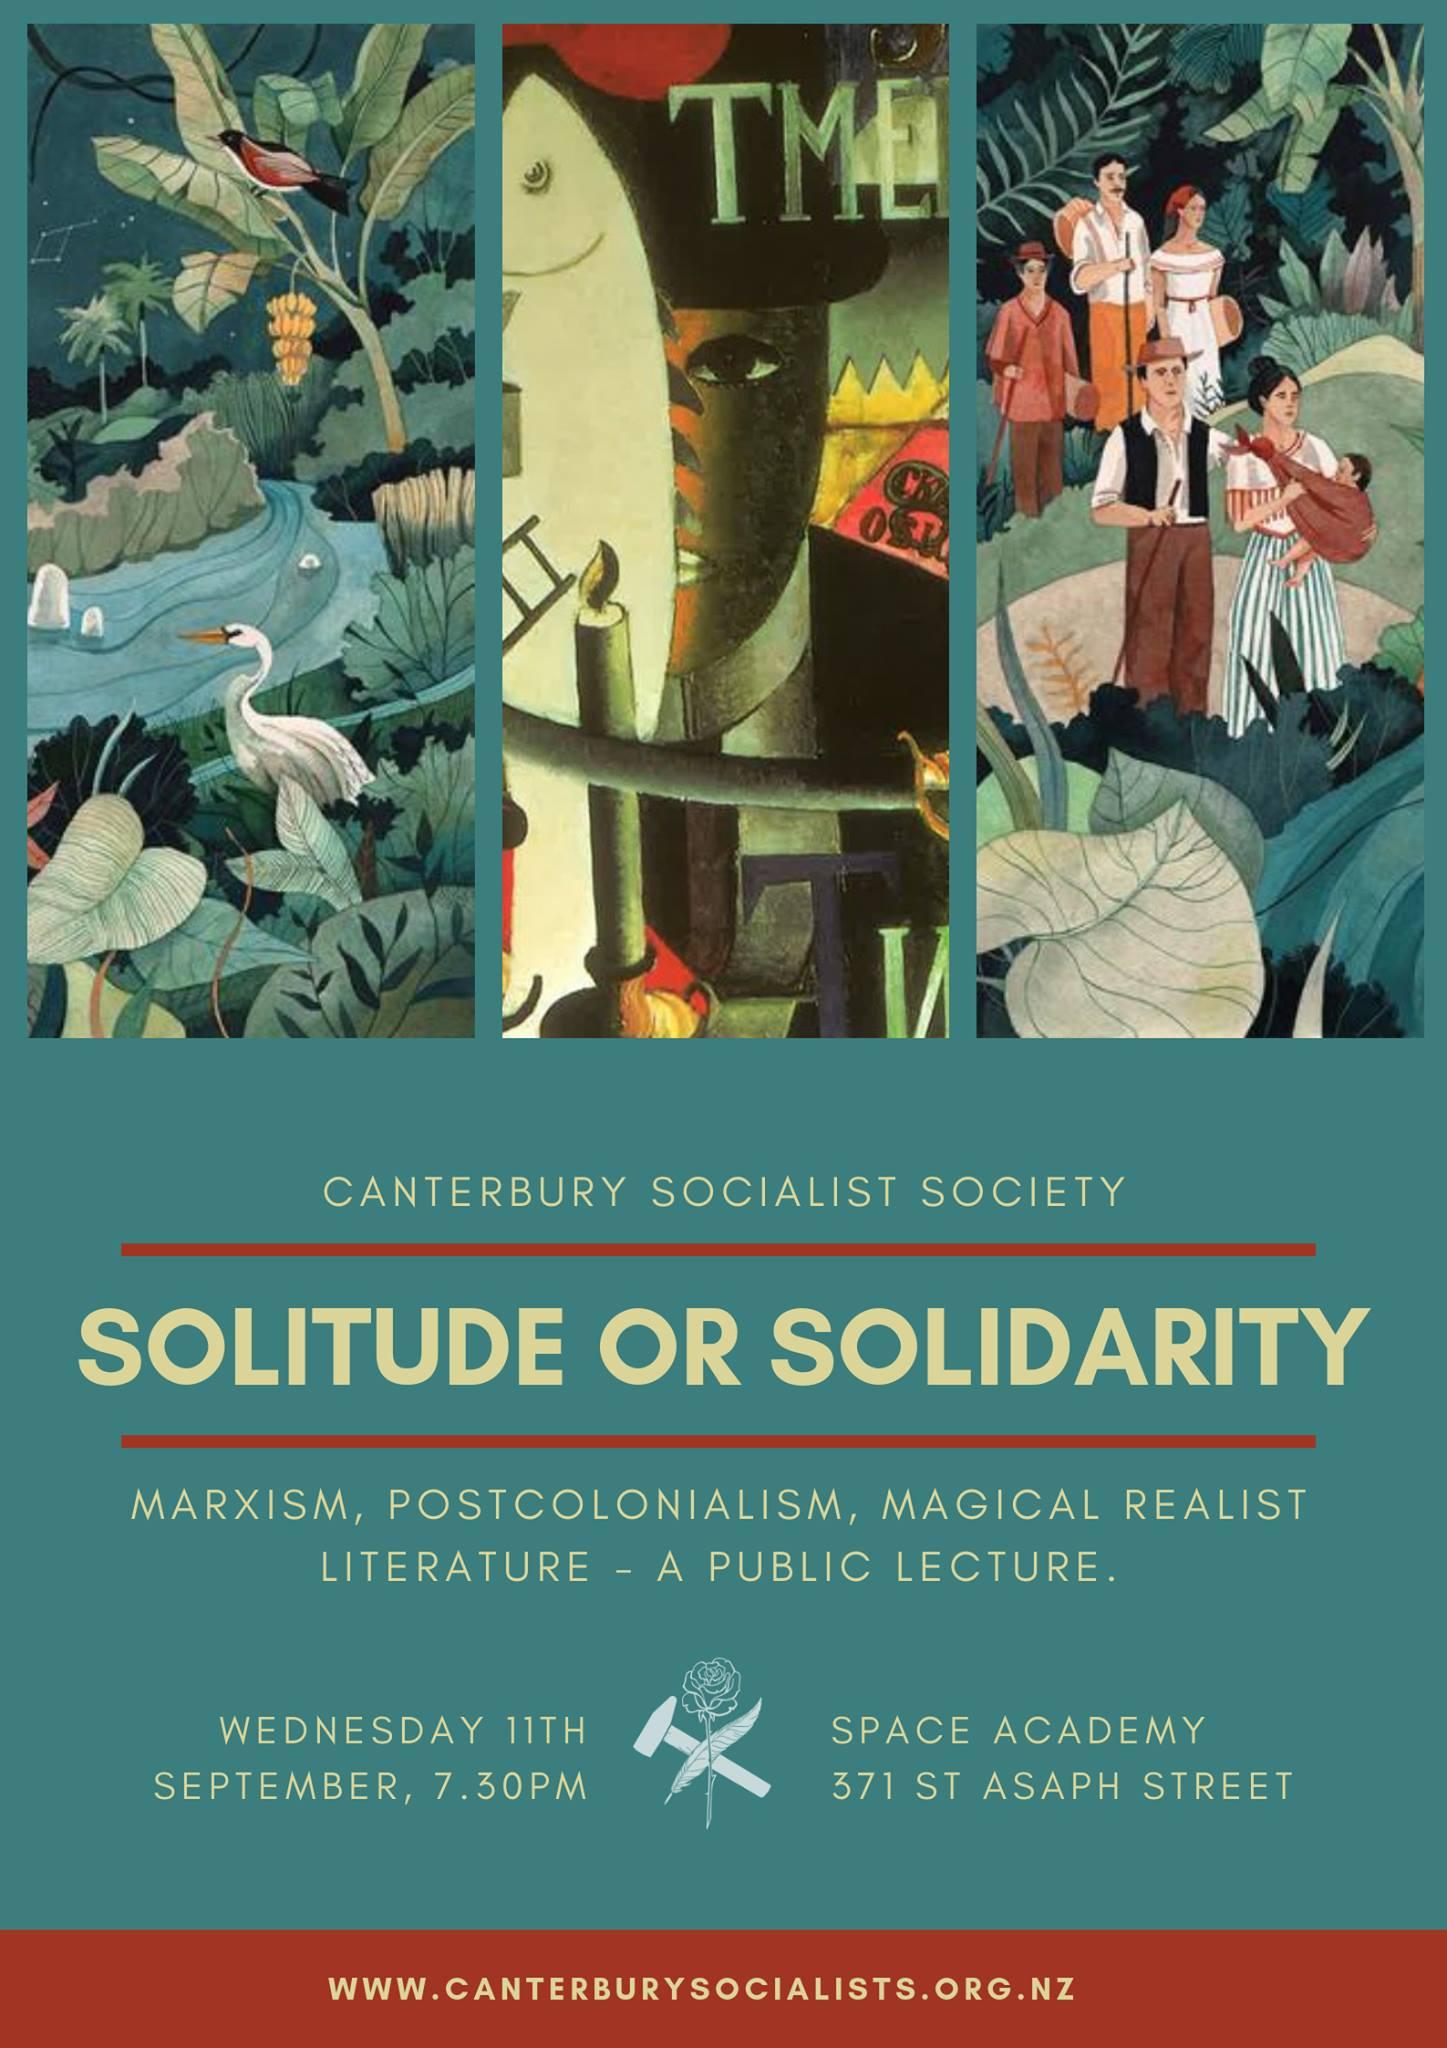 POSTPONED: CSS Public Lecture: Solitude or Solidarity